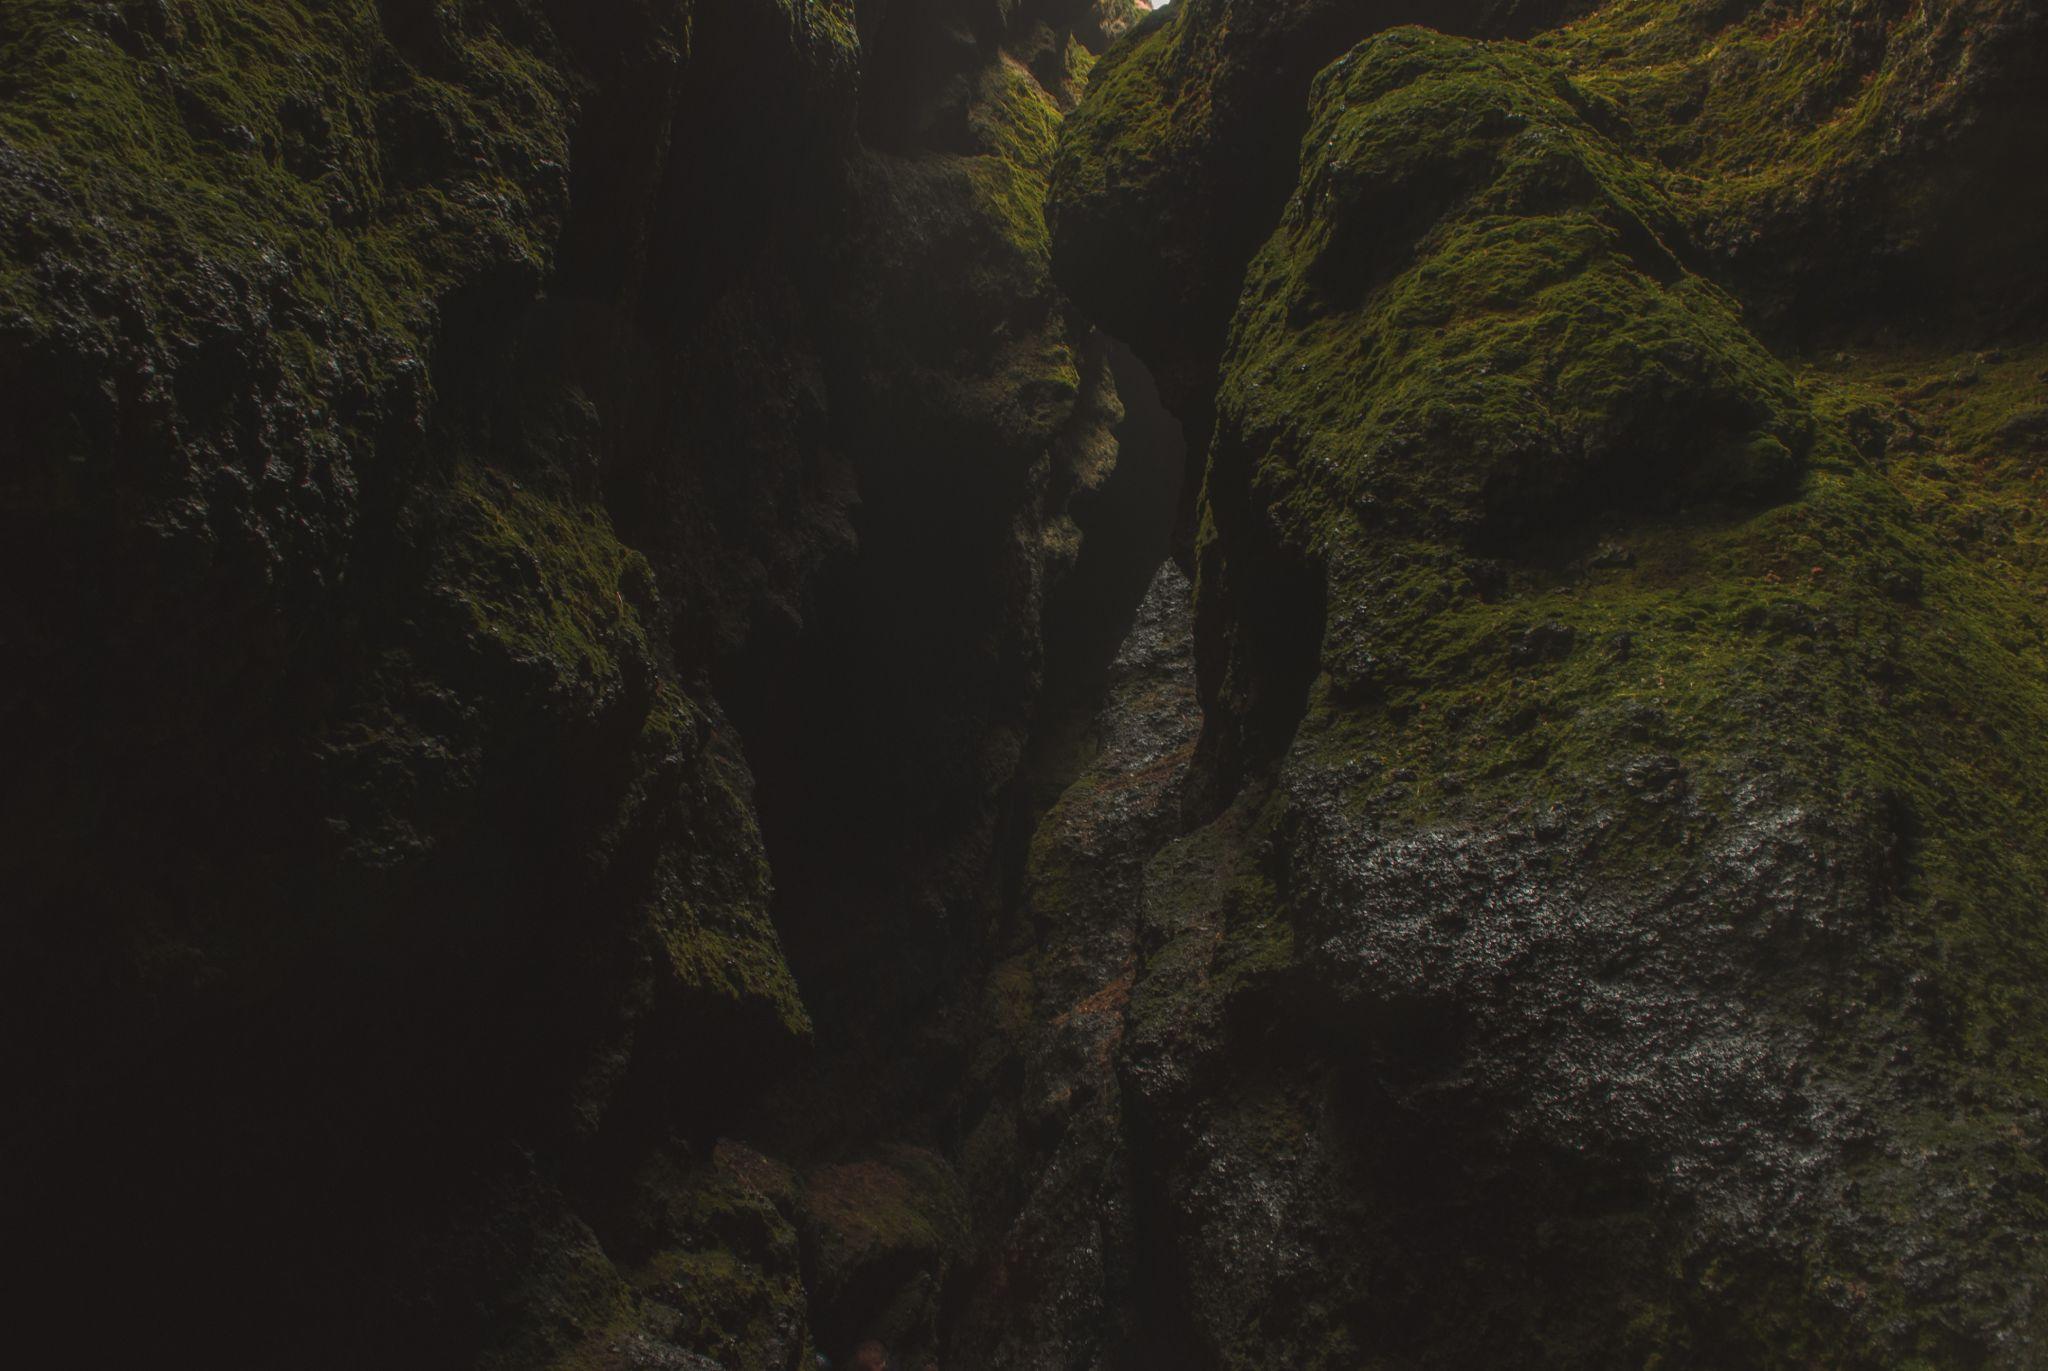 RAUĐFELDSGJÁ Canyon, Snæfellsnes Peninsula, Iceland., Iceland